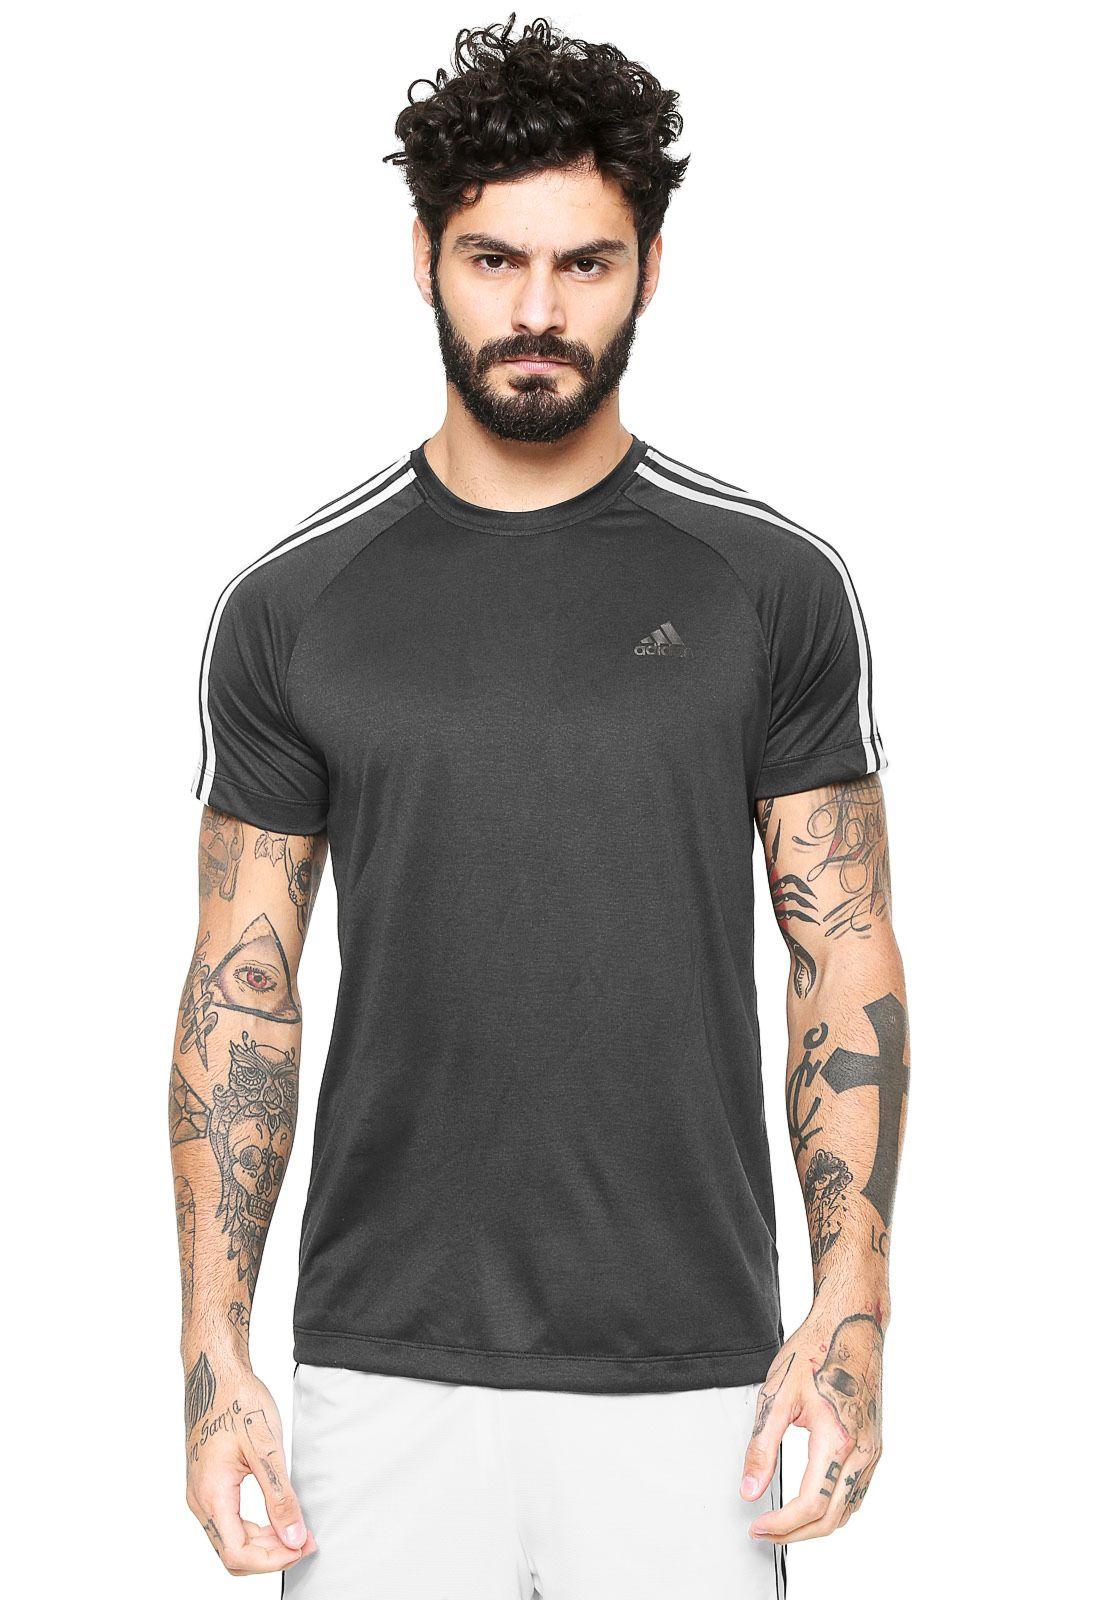 8f73a8121cb Camiseta adidas Performance ESS 3S EGB Preta - Marca adidas Performance